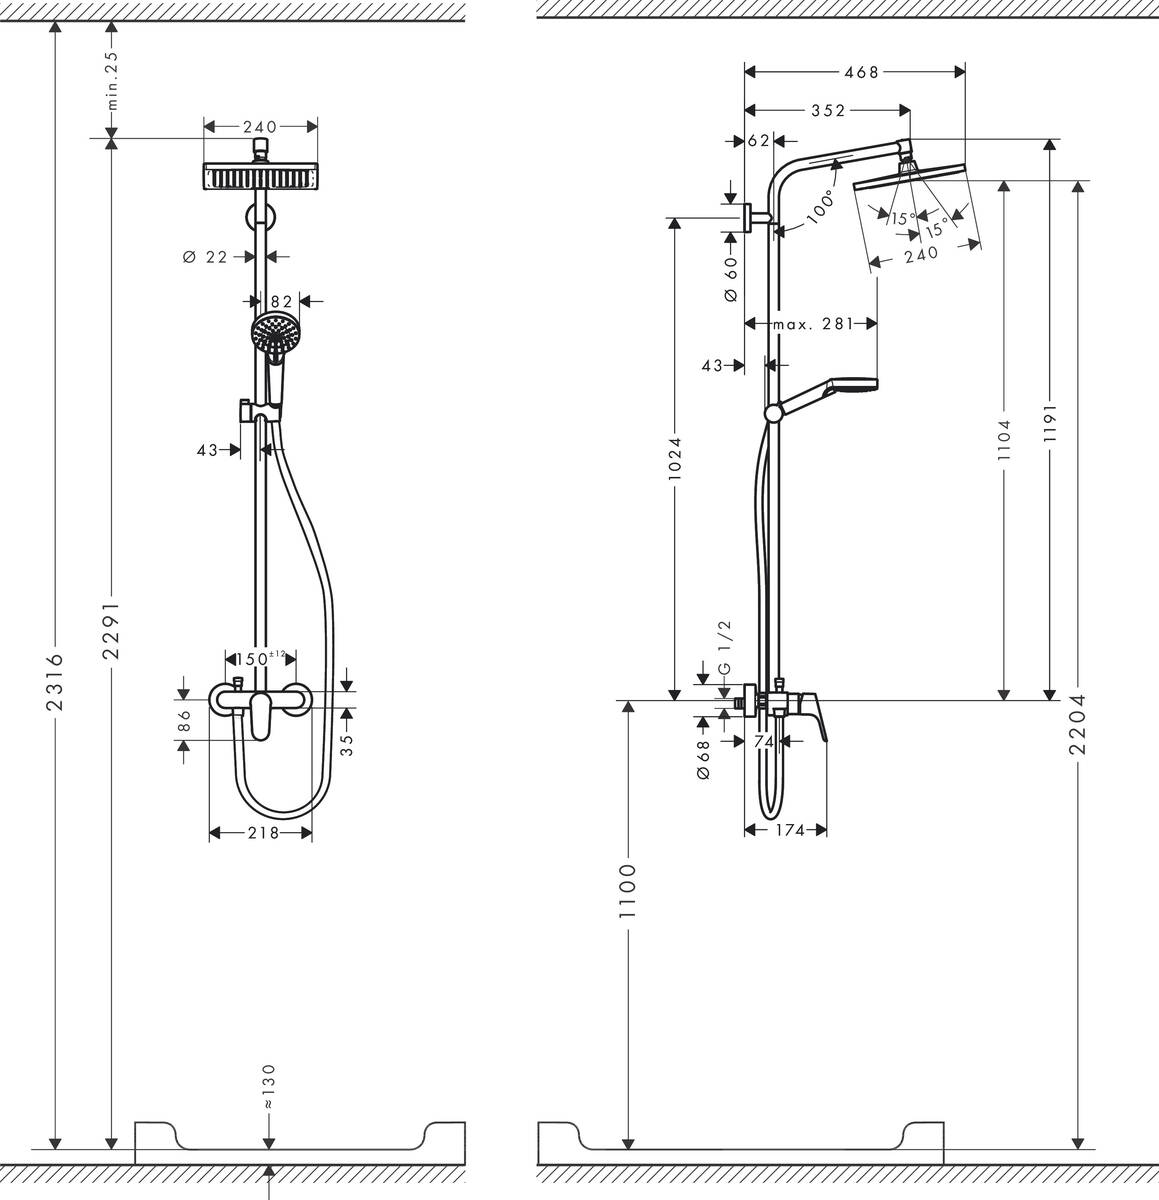 hansgrohe showerpipes crometta e 1 strahlart art nr 27284000 hansgrohe de. Black Bedroom Furniture Sets. Home Design Ideas